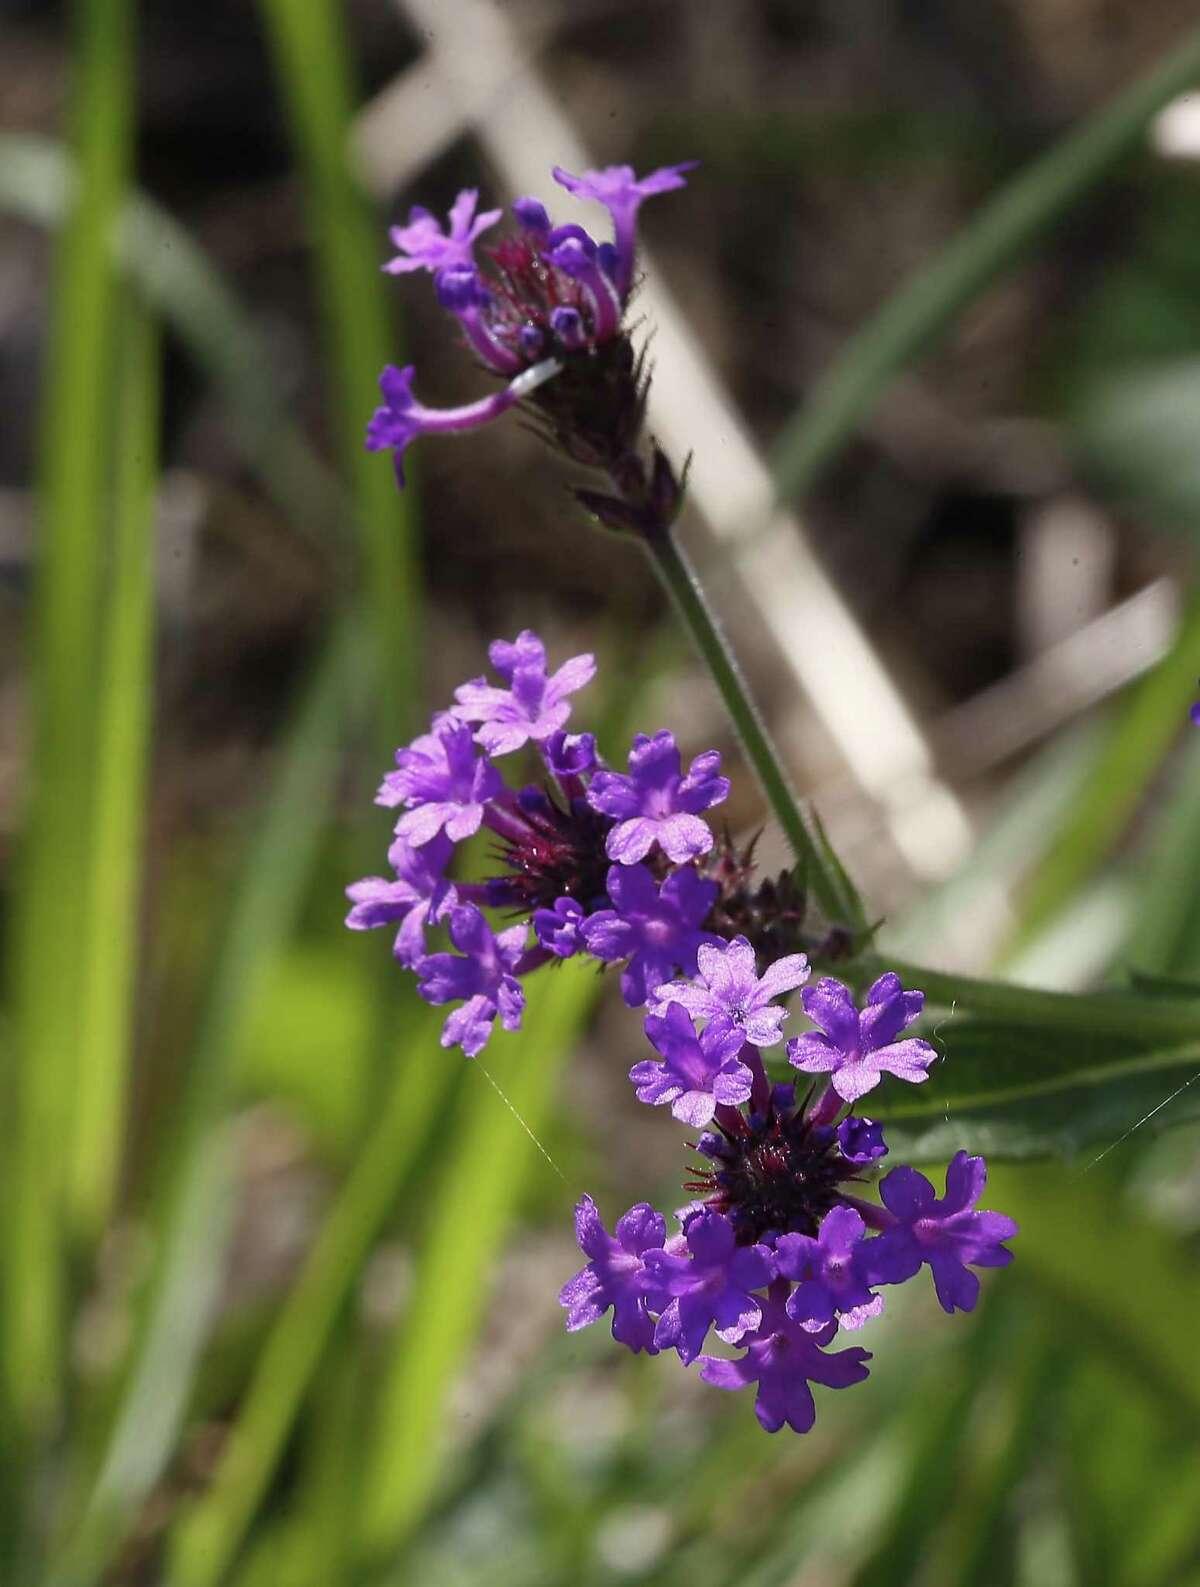 A native verbena grows along a path at the arboretum.